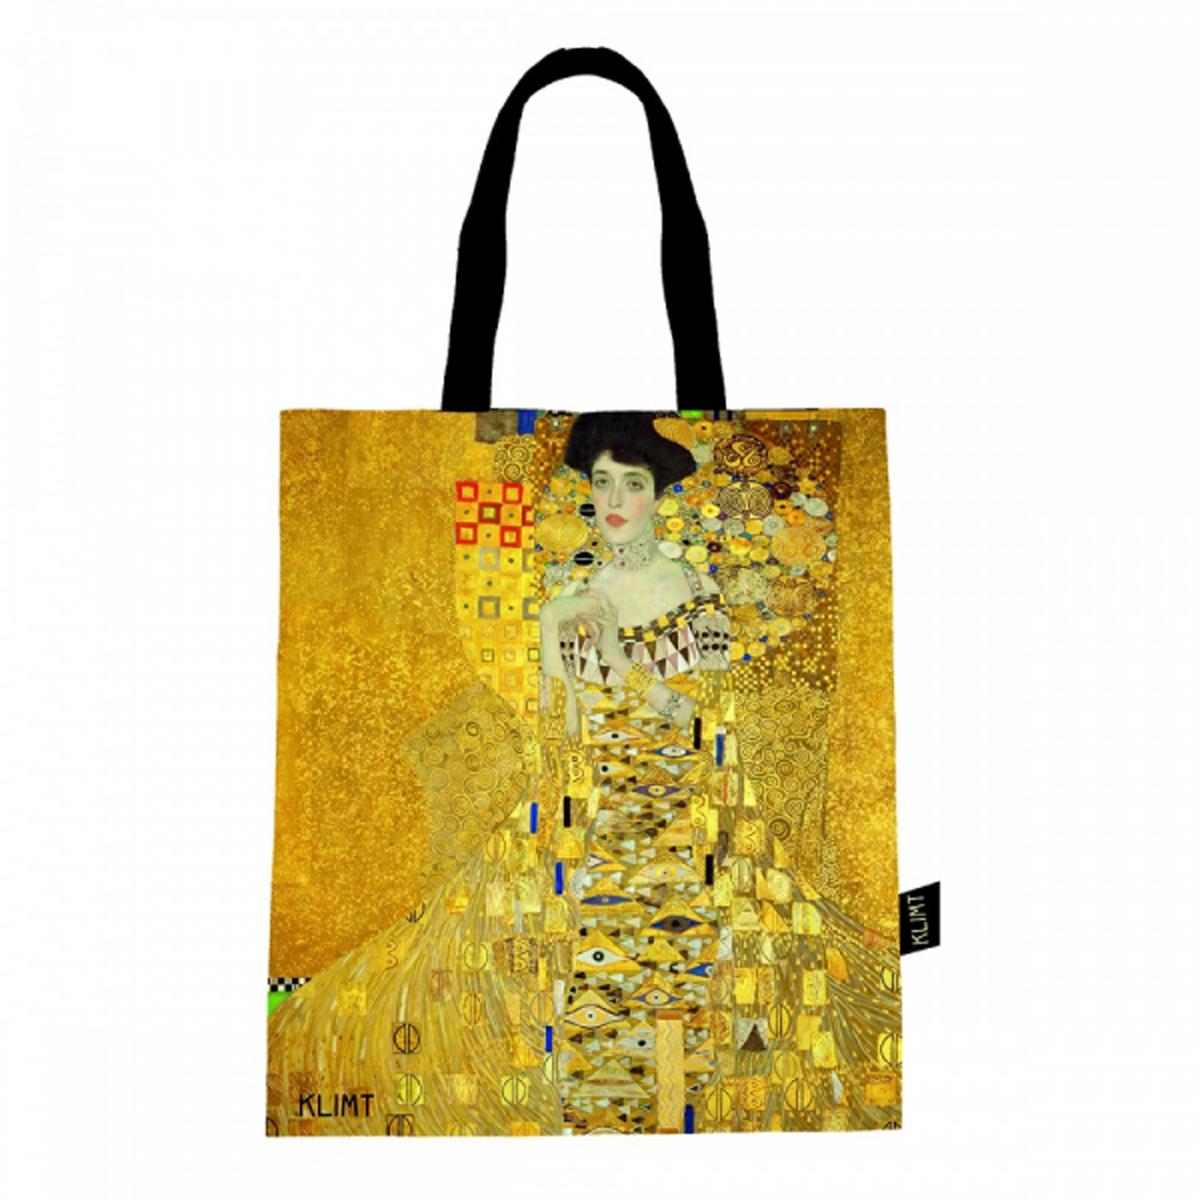 Sac coton / tote bag \'Gustav Klimt\' (Adele) - 44x38 cm - [R2982]